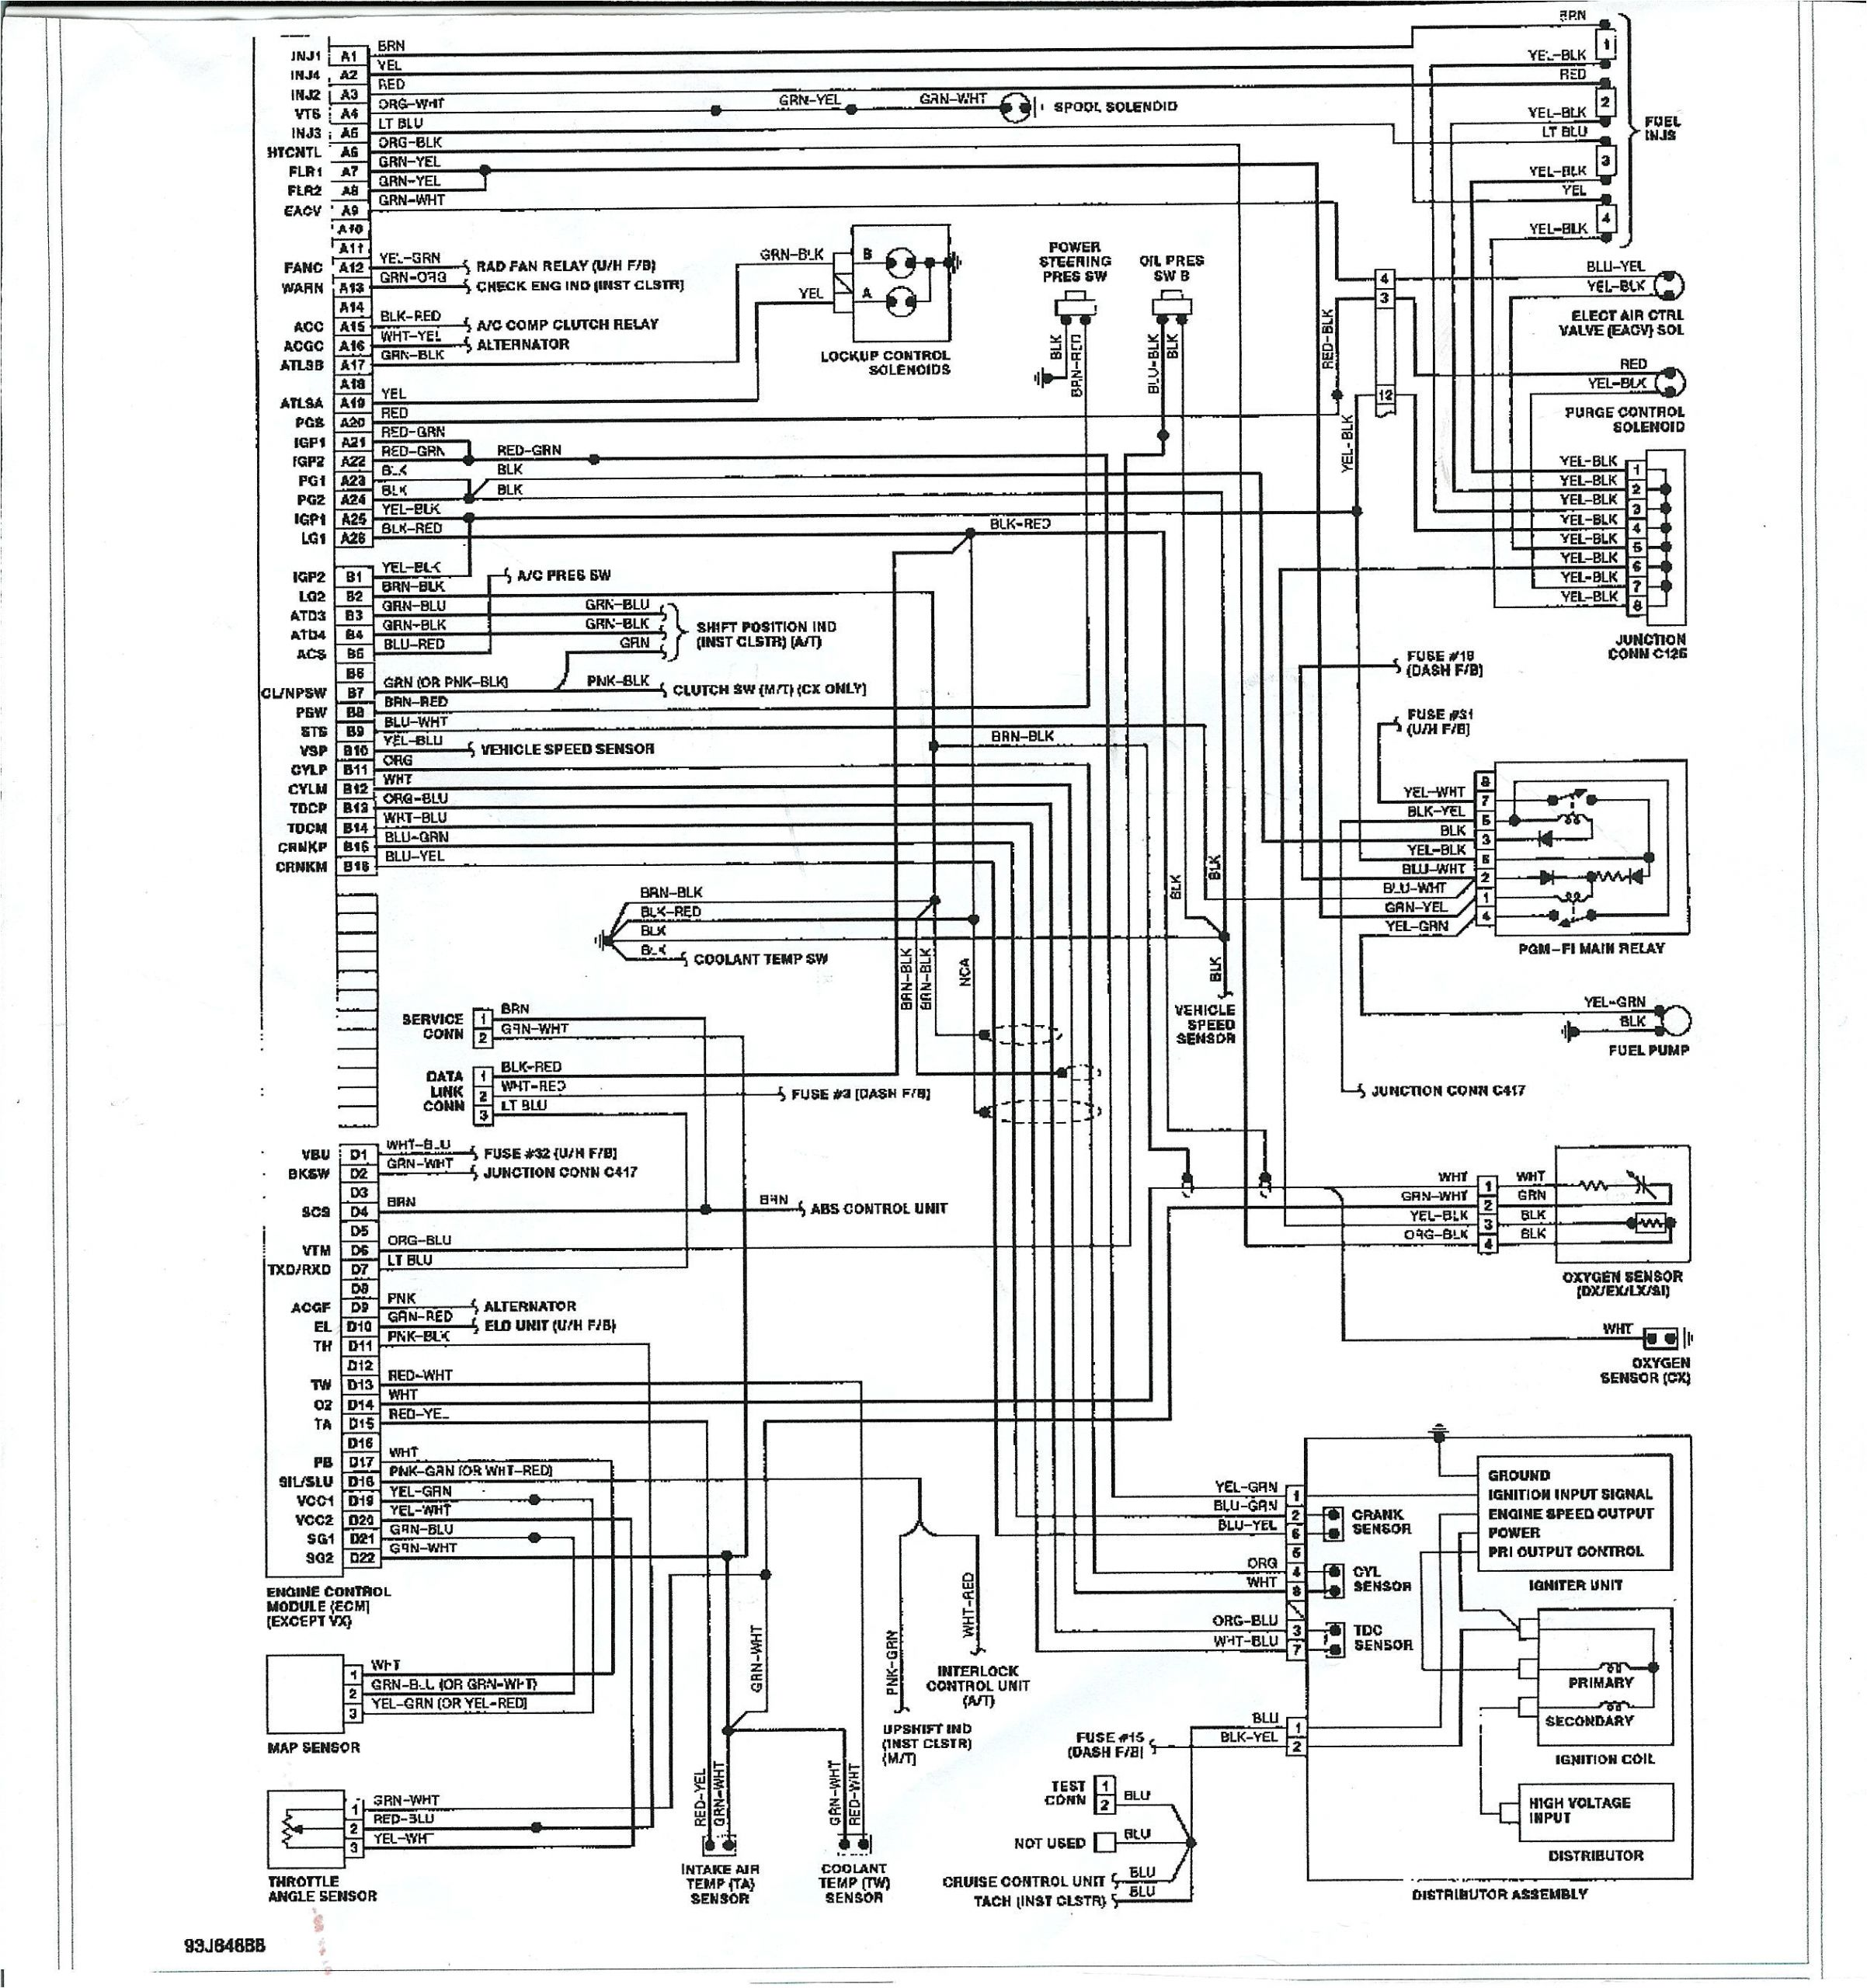 honda civic engine diagram as well 1988 crx wiring diagram database jpg